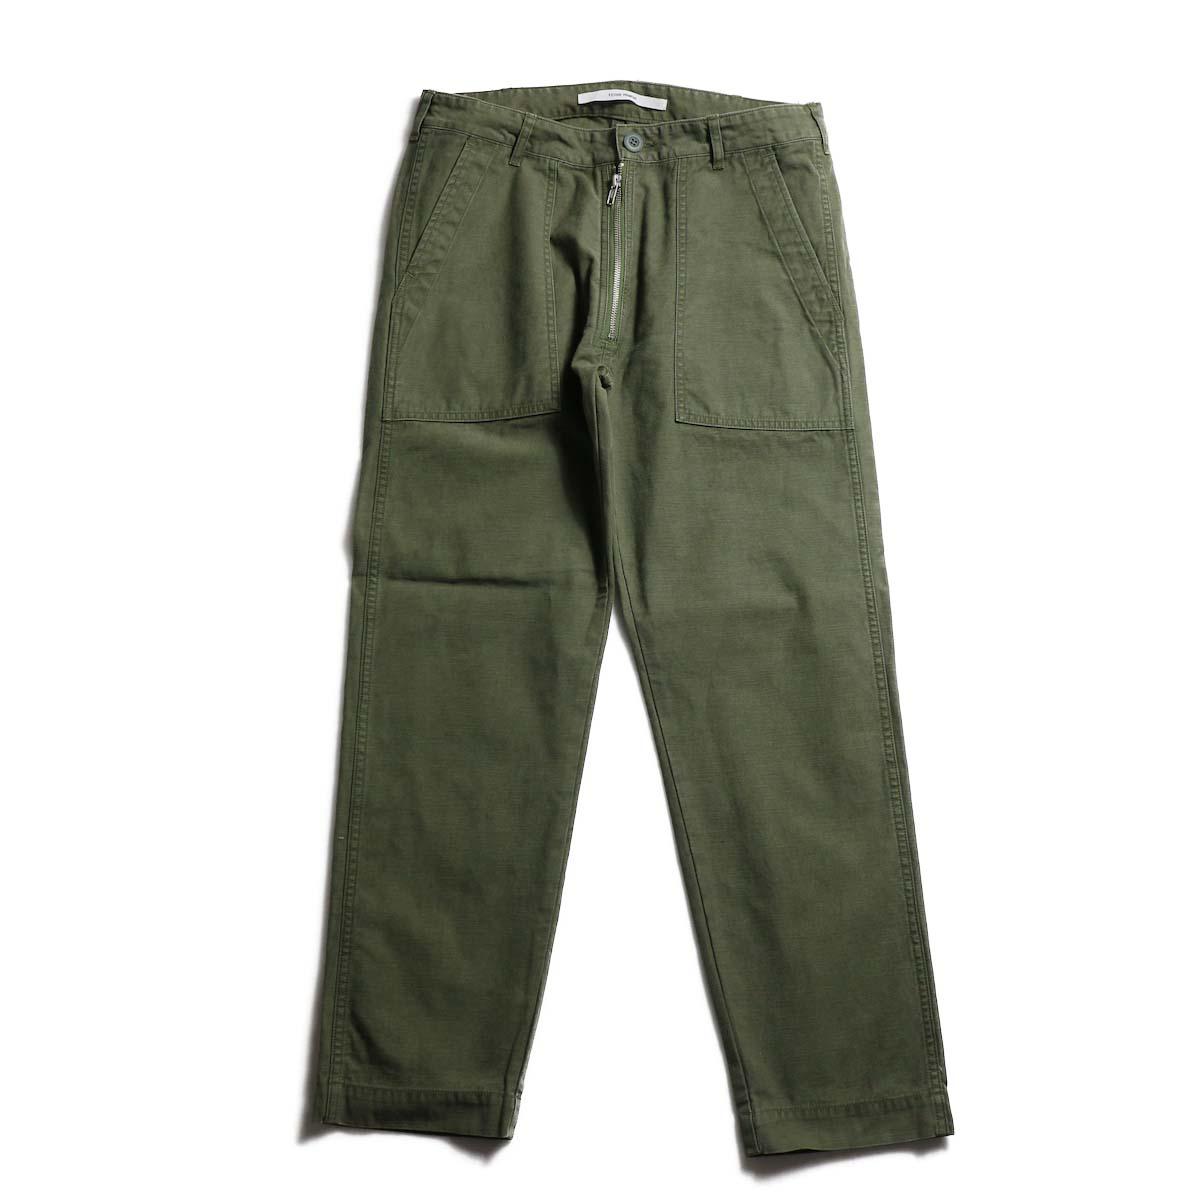 FUTURE PRIMITIVE / FP FZ Baker Pants -OLIVE